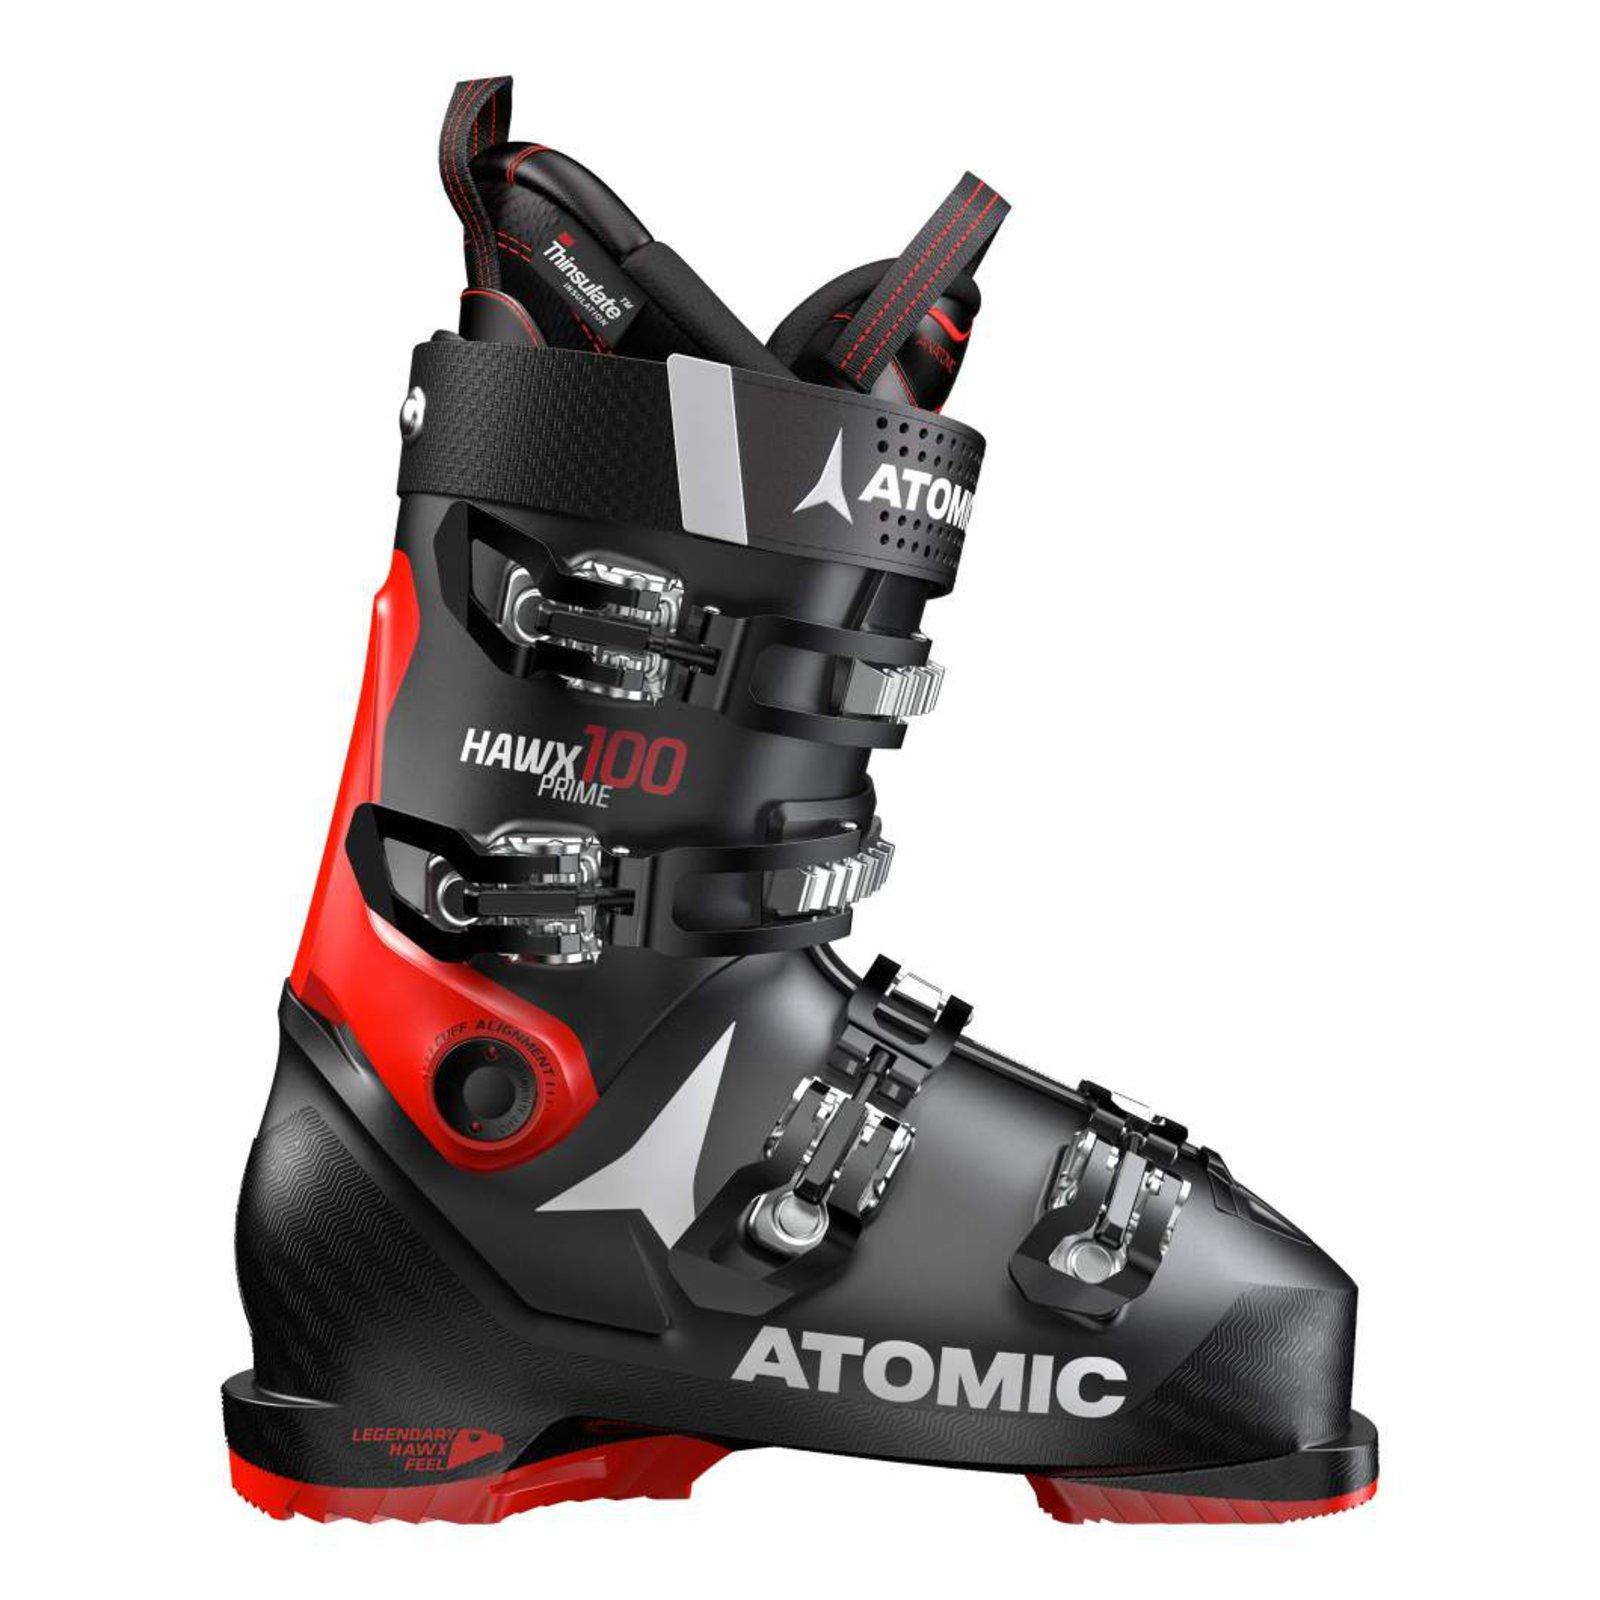 02d4e0f1357 Lyžařské boty ATOMIC HAWX PRIME 100